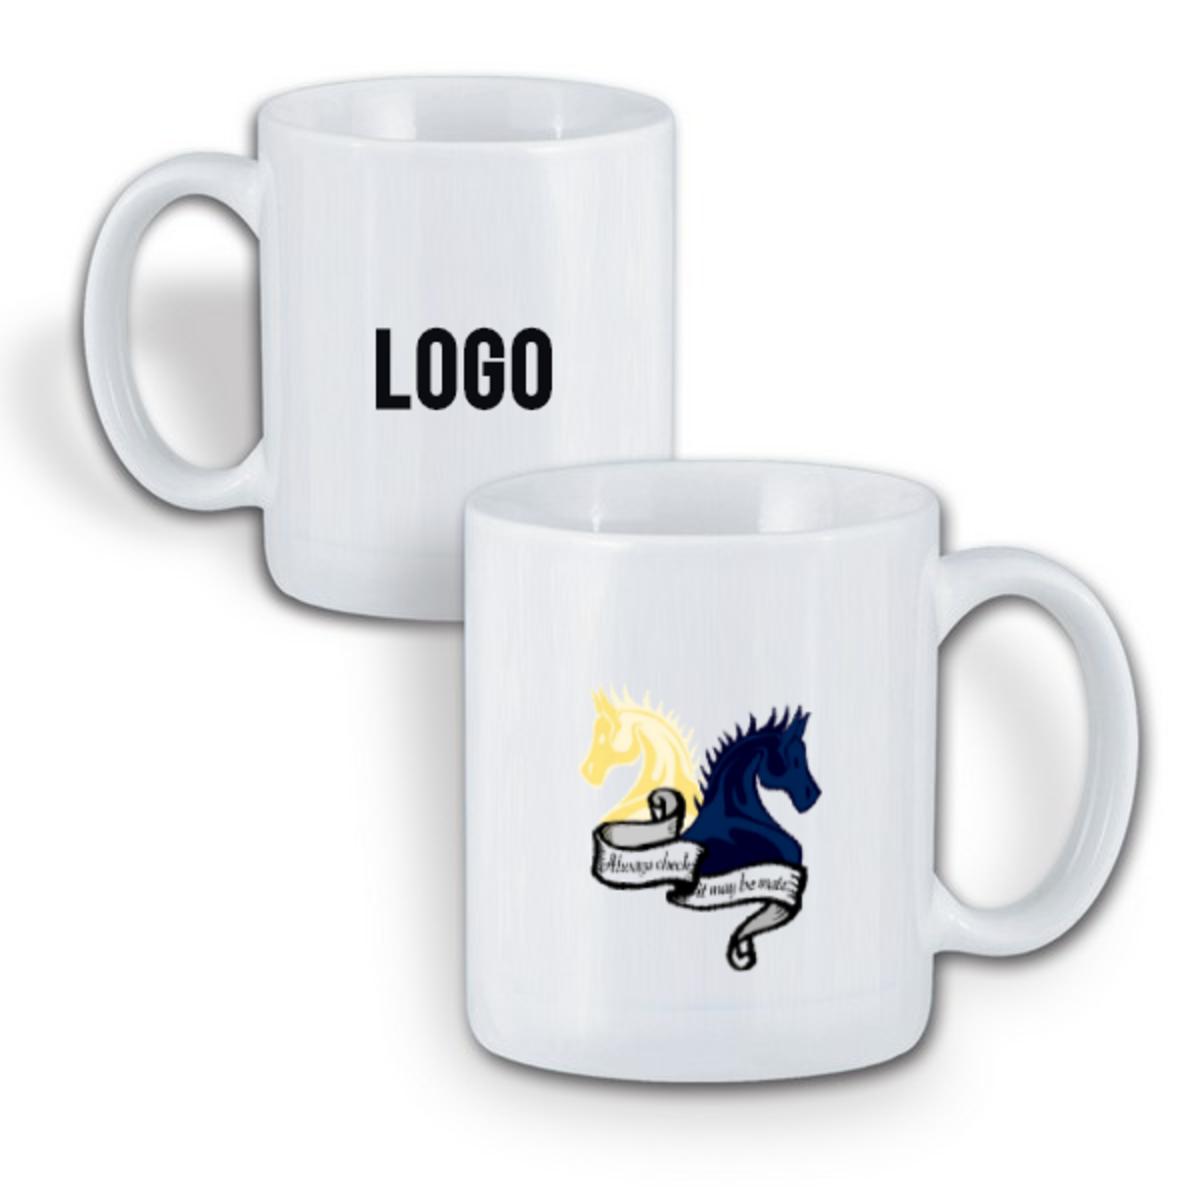 11 OZ. Ceramic Mug